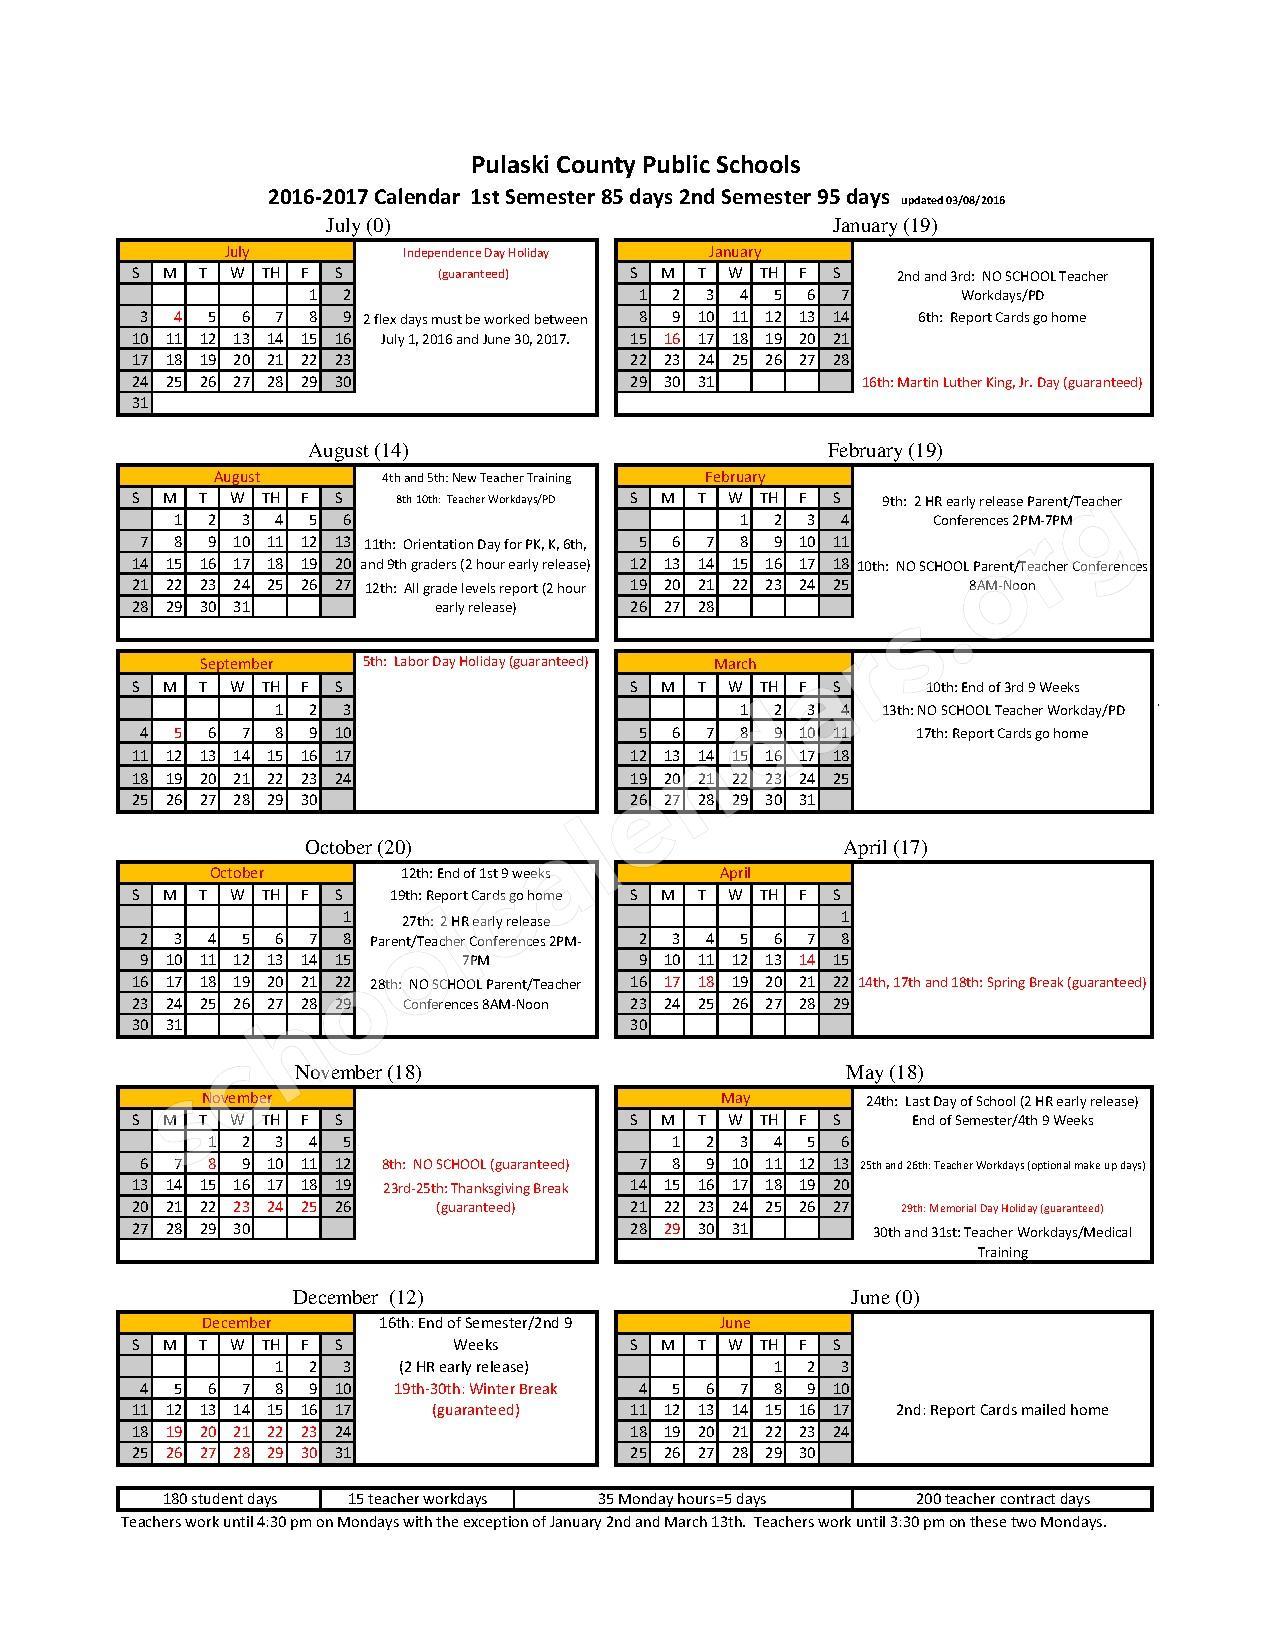 2016 - 2017 District Calendar page 1